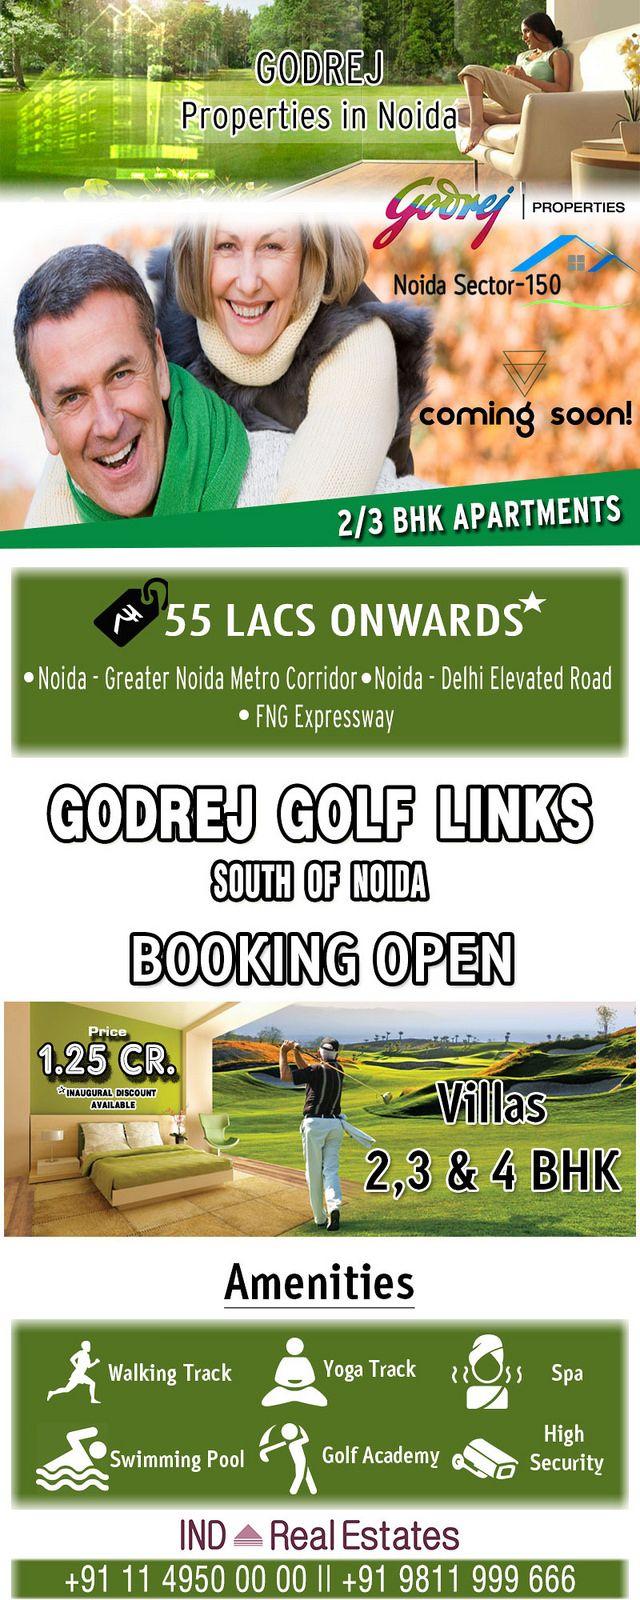 https://flic.kr/p/RJ91se | Godrej Properties | Godrej Properties presenting their new residential project nearby Noida Greater Noida Expressway, Sector 150 Noida & greater noida Sector 27, near Pari Chowk. Click here for more info: www.indrealestates.com/builder/godrej-properties/